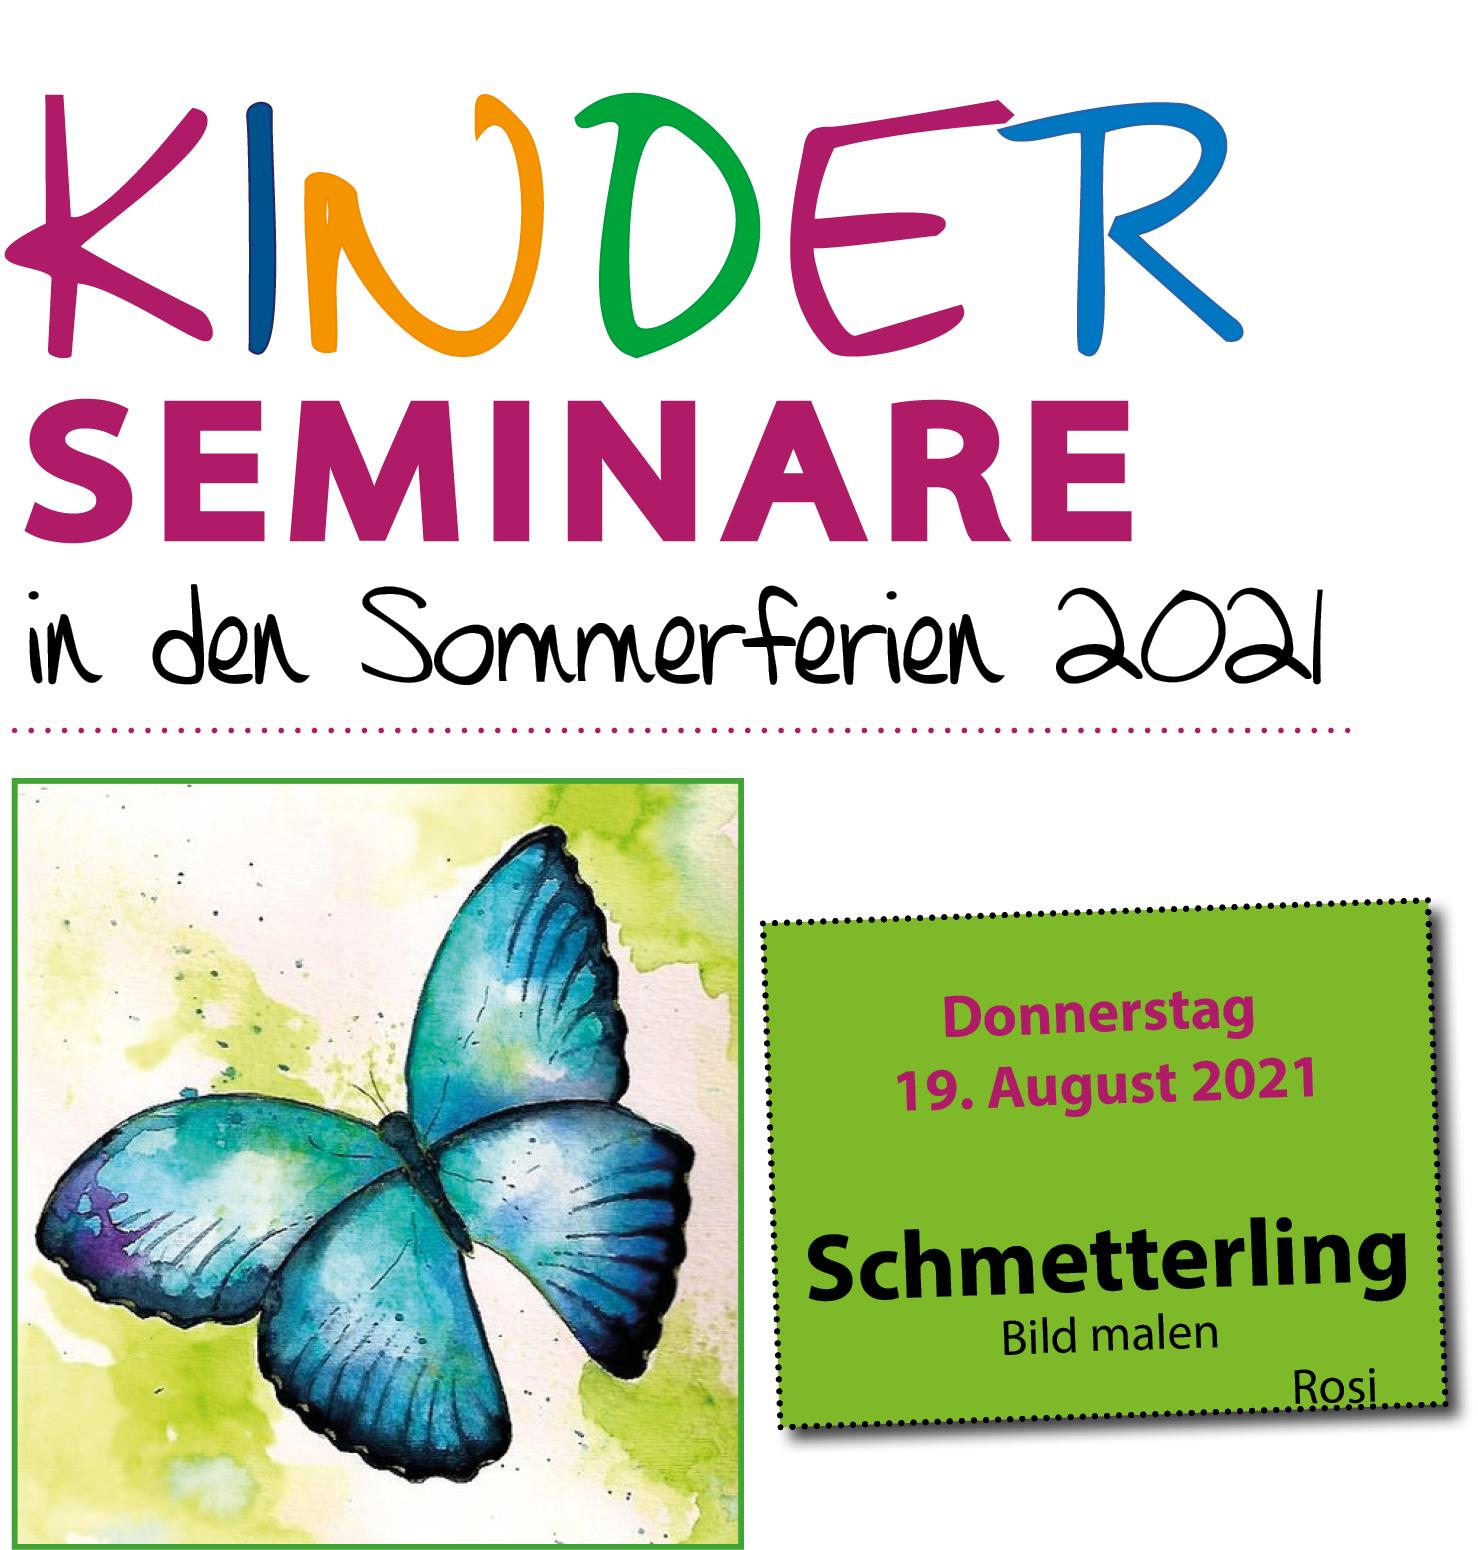 Kinderseminar Schmetterlingsbild